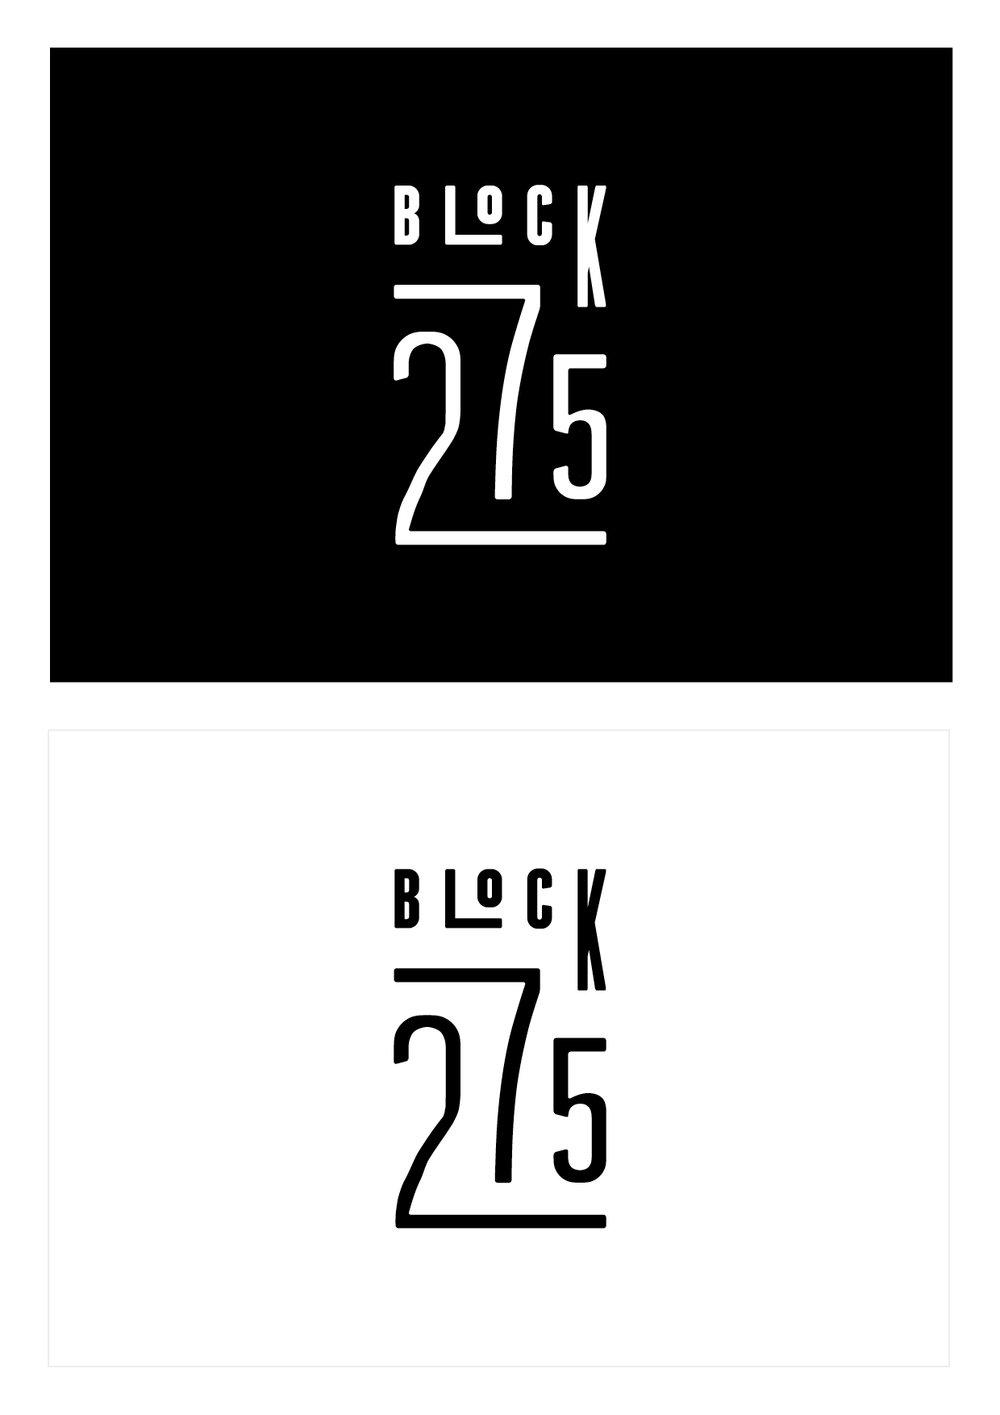 Block 275_Logo Concept 2 - 2.jpg